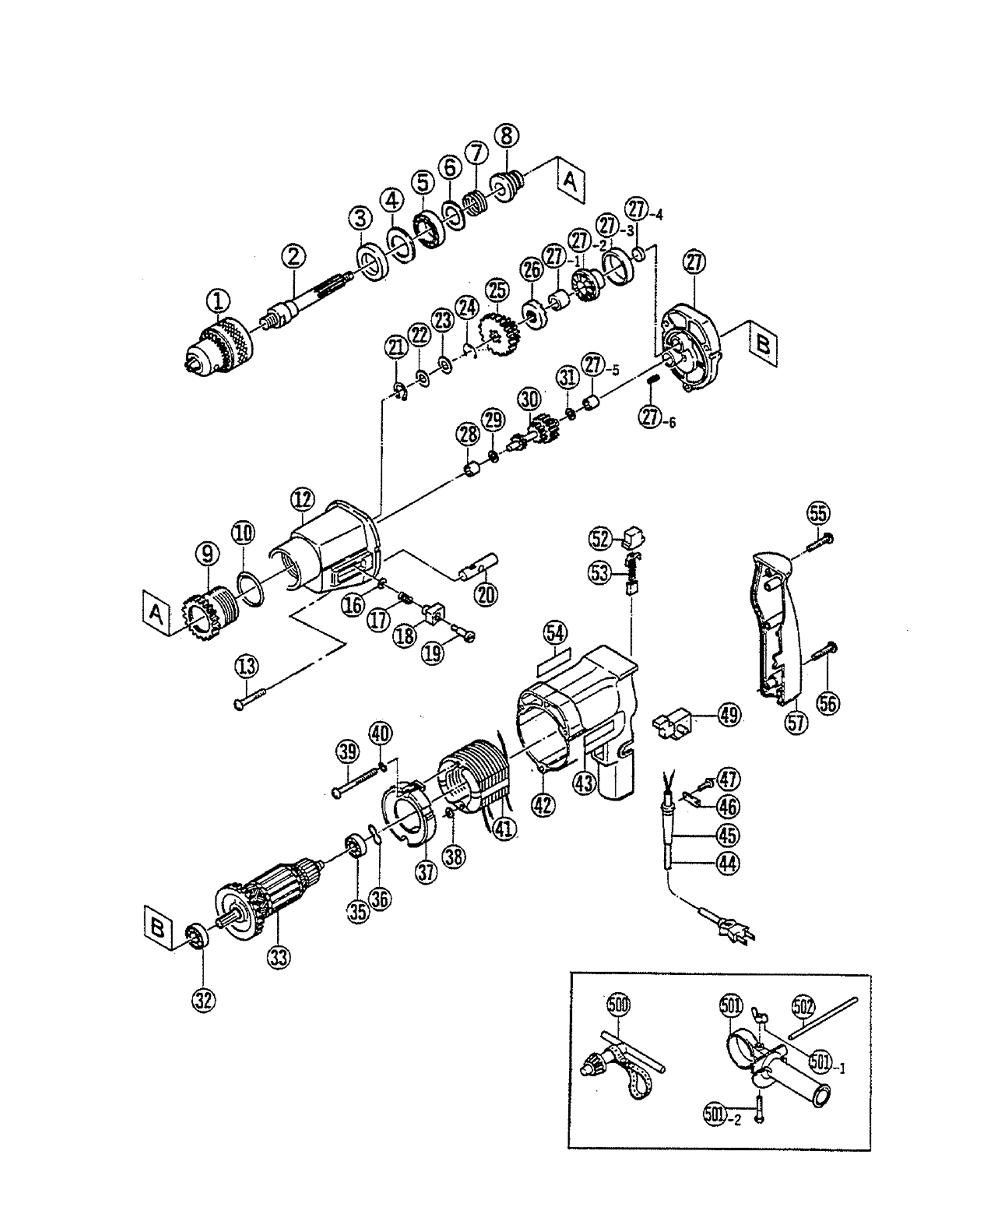 Buy Ridgid Pd1921v Replacement Tool Parts Ridgid Pd1921v